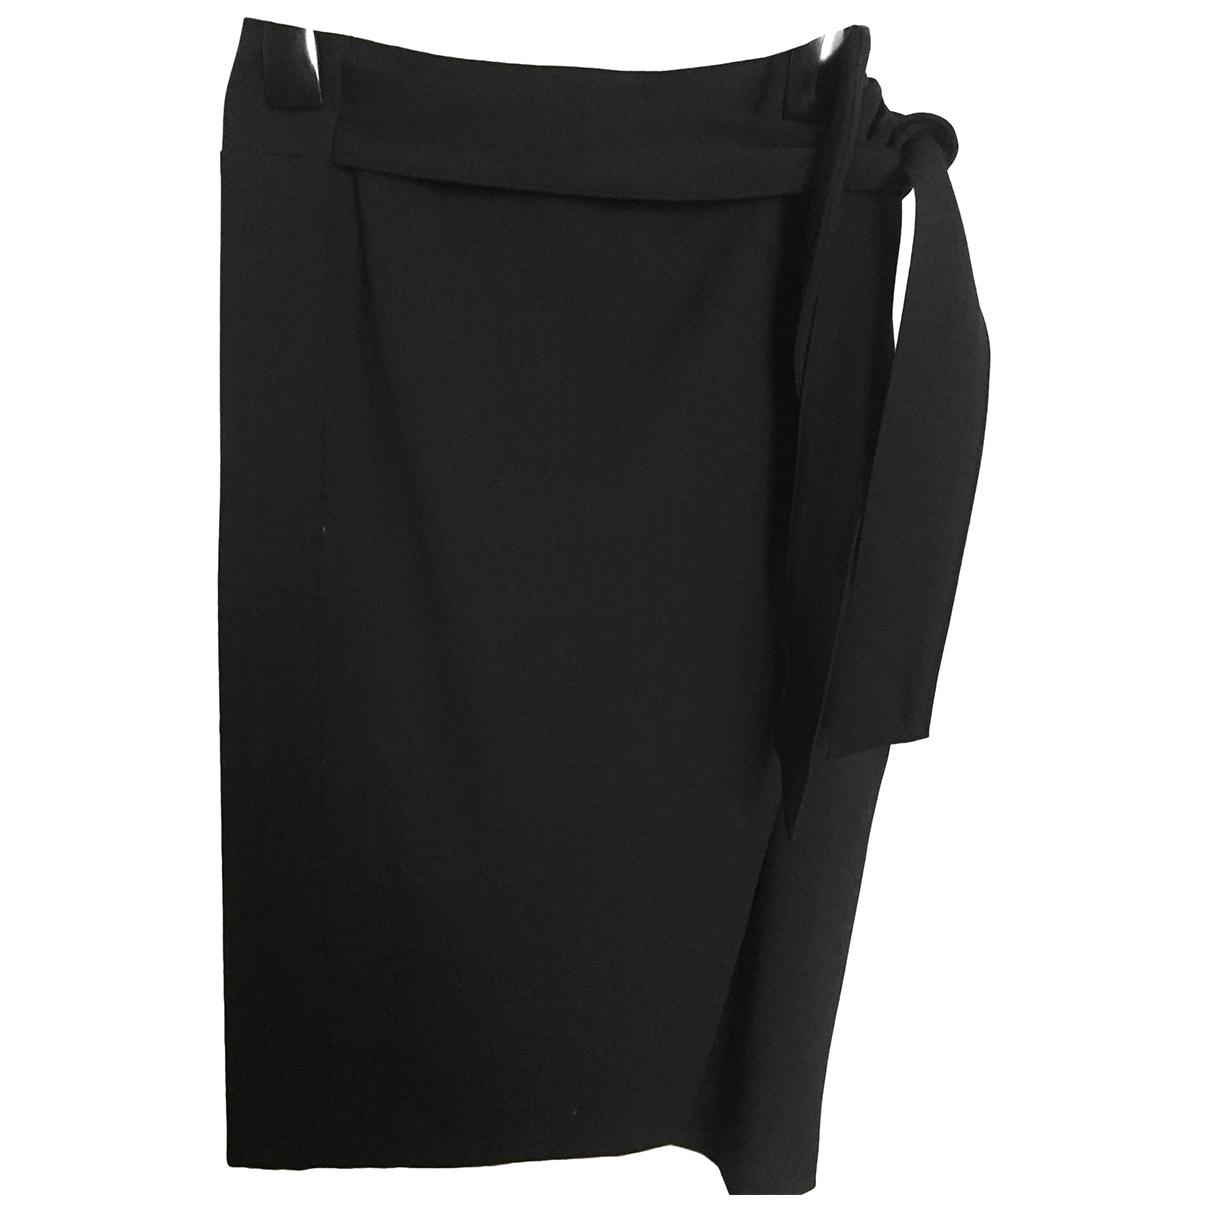 Sézane Fall Winter 2019 Black Wool skirt for Women 36 FR